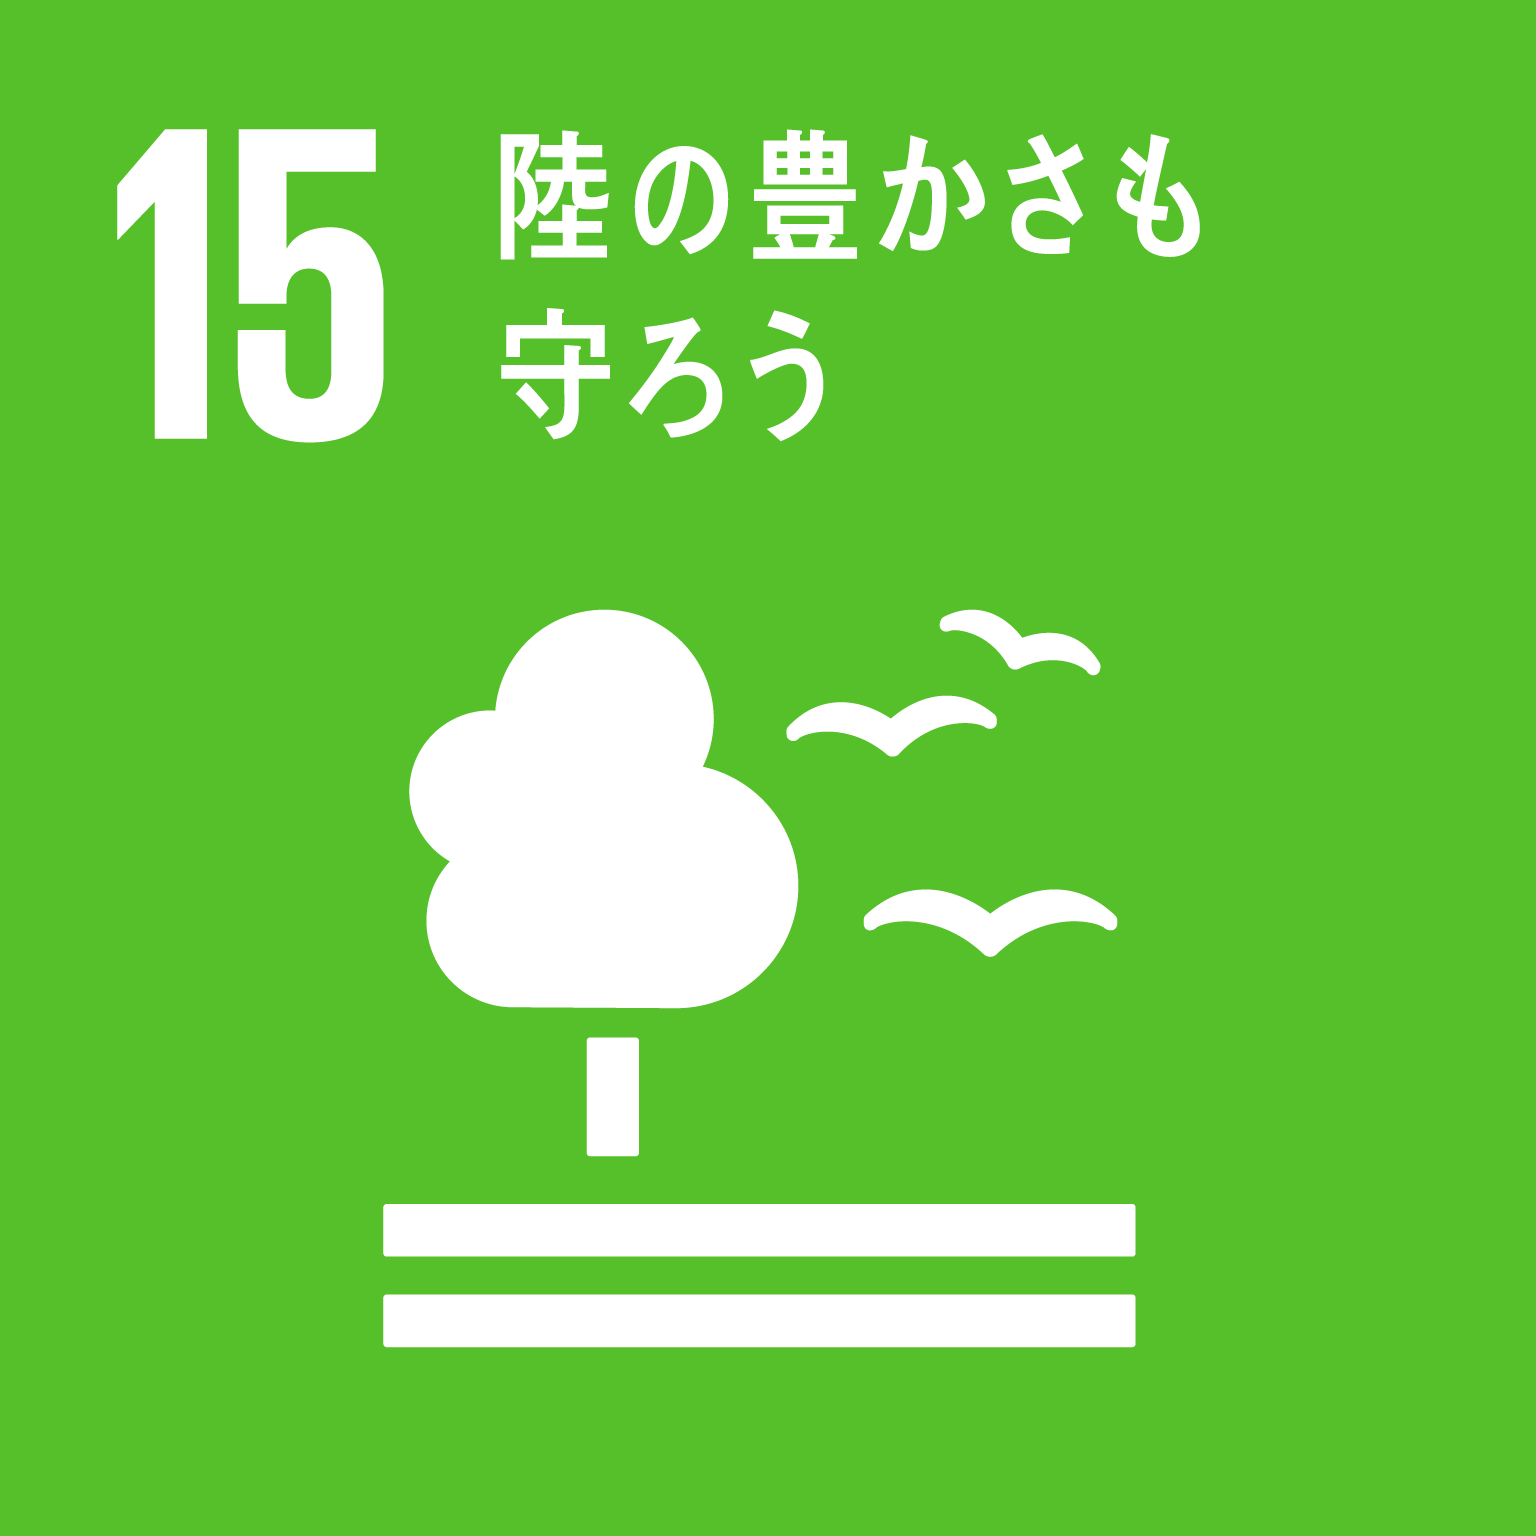 Sdgs Insight ビジネスを通じた社会的課題の解決 日本